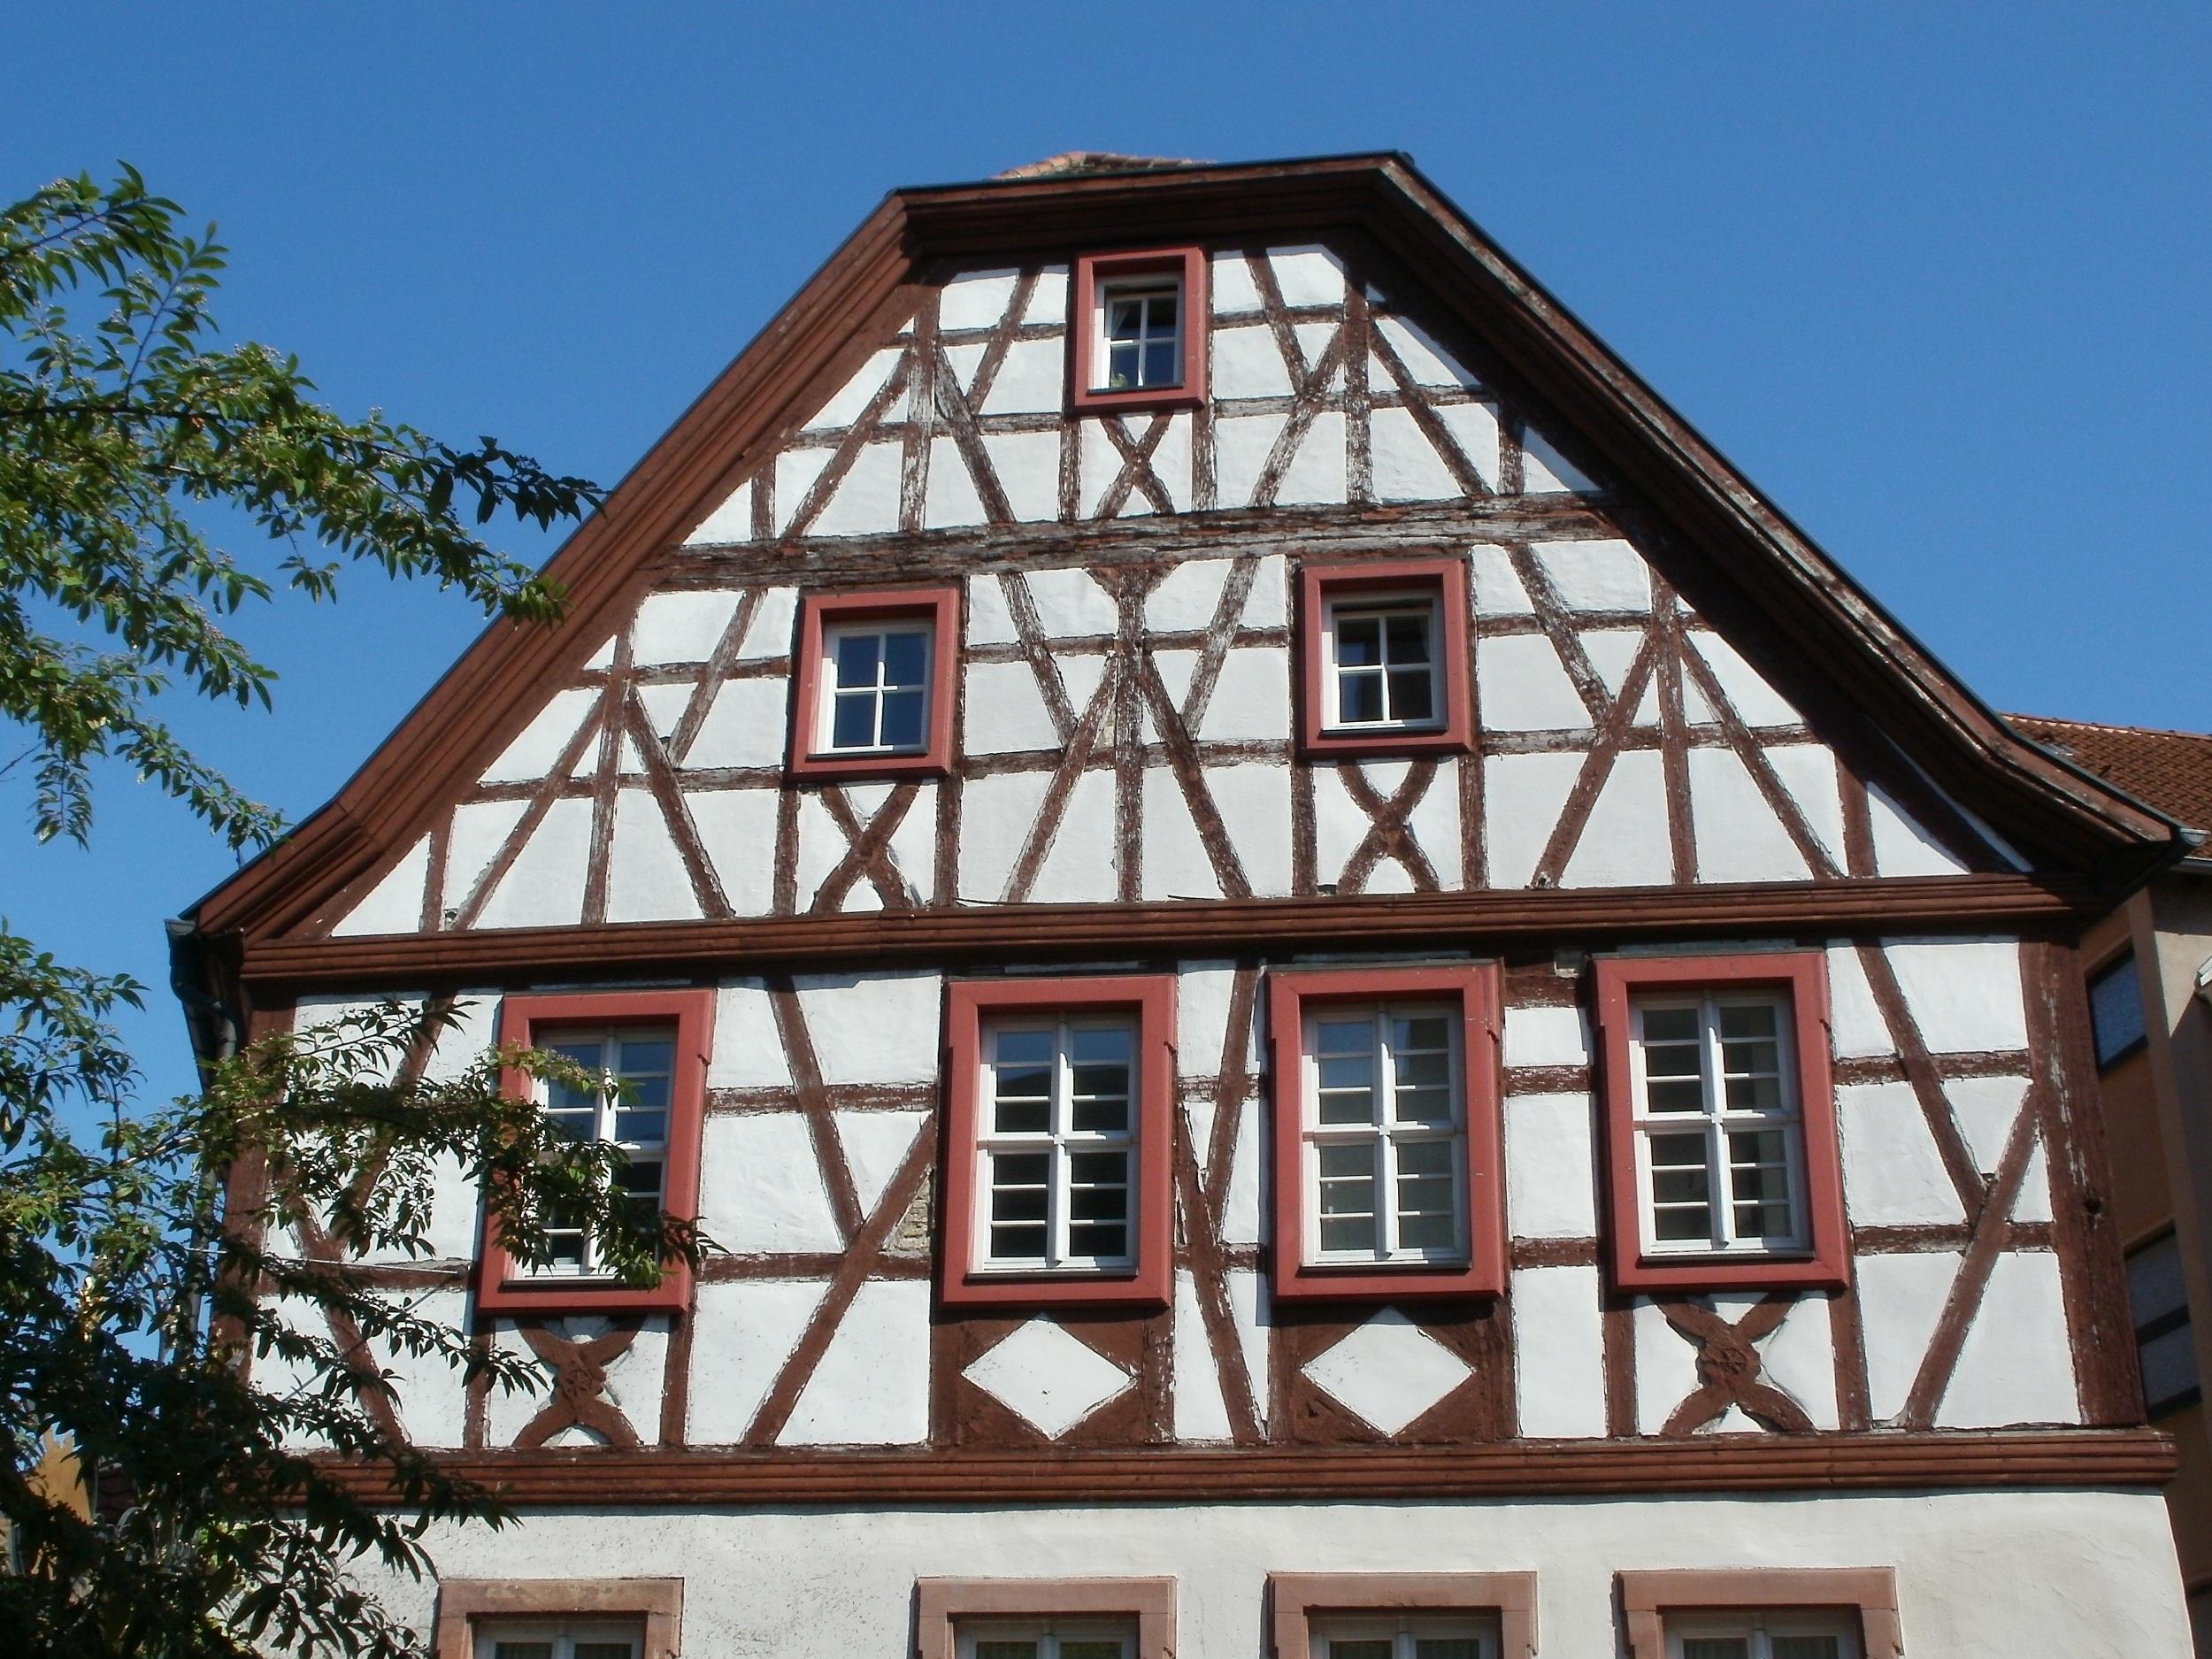 Fotos gratis : arquitectura, estructura, casa, ventana, techo ...